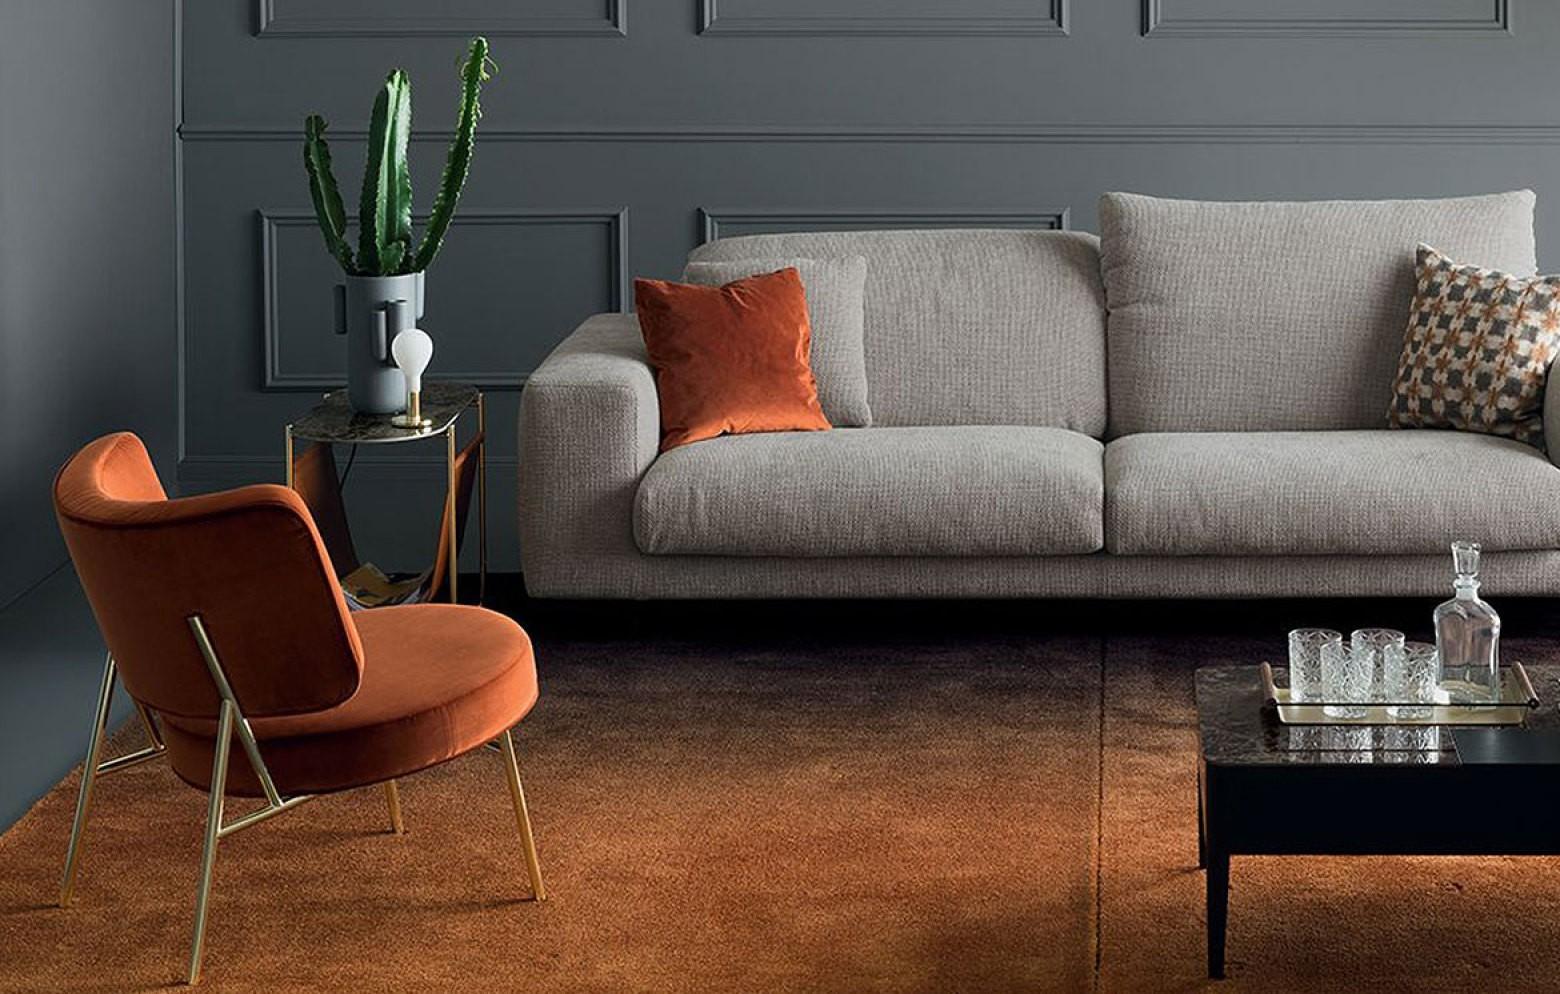 coco lounge stuhl sessel liegen polsterm bel who 39 s perfect. Black Bedroom Furniture Sets. Home Design Ideas